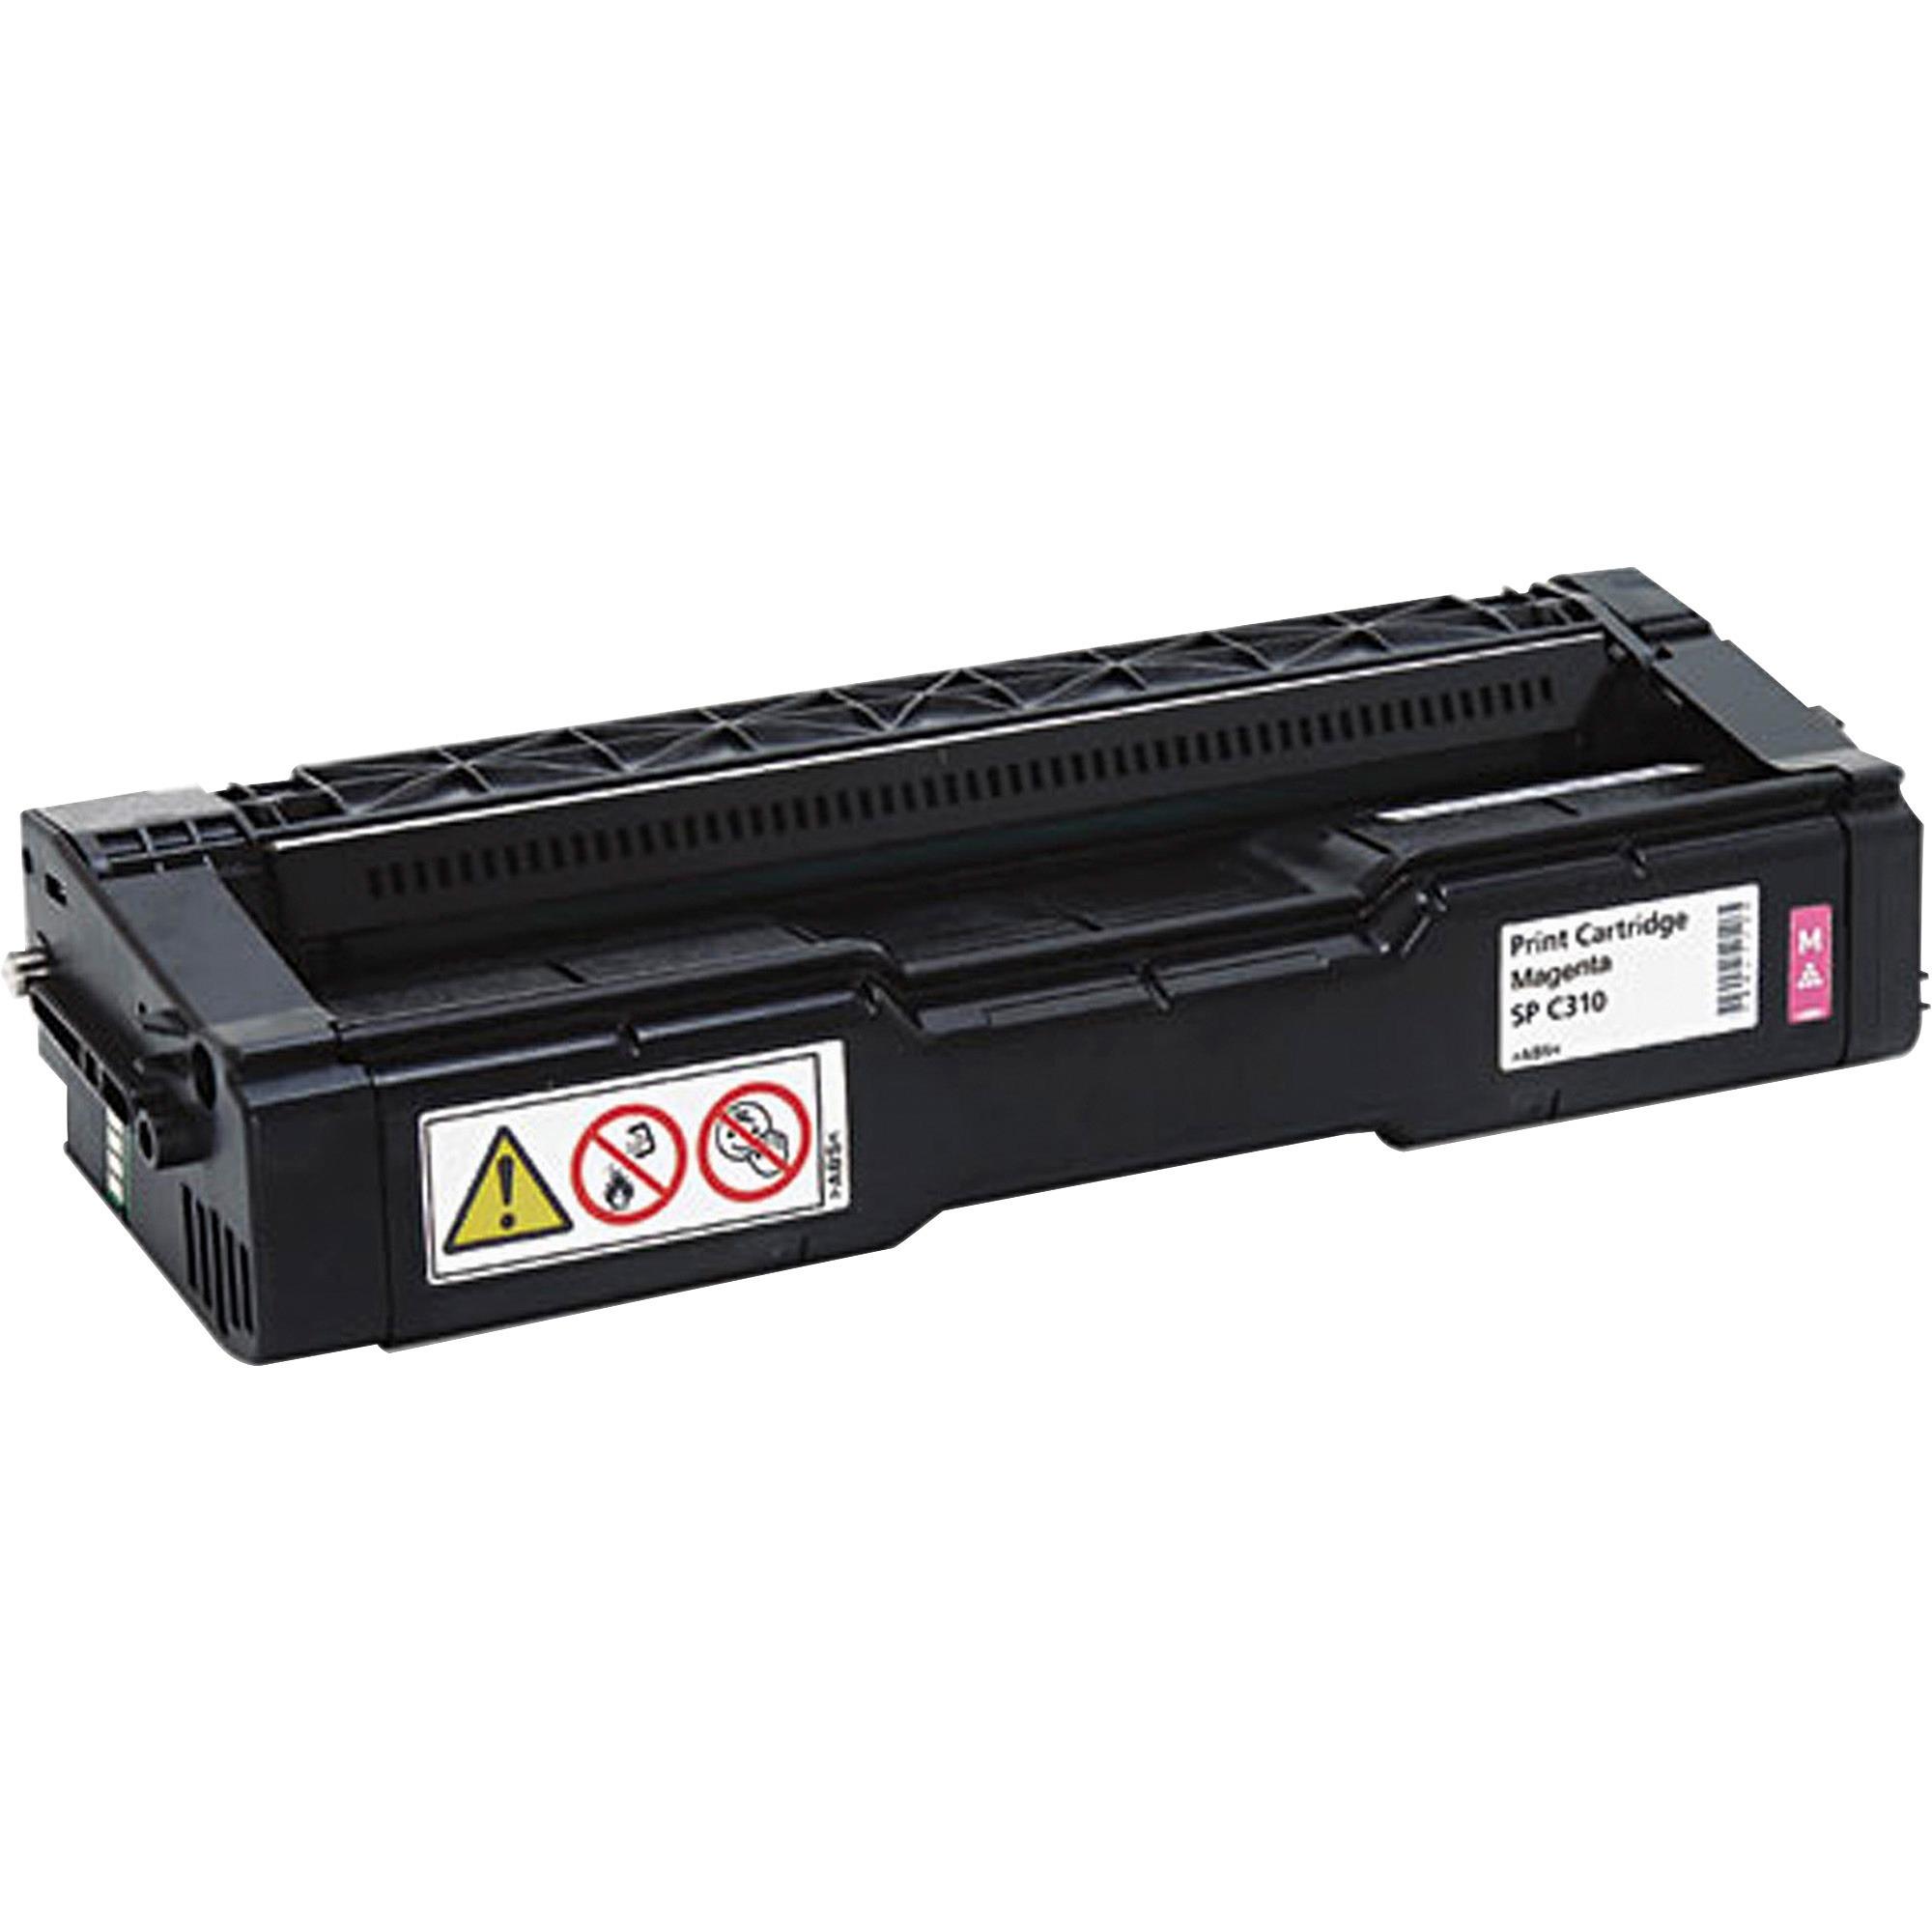 Ricoh Aficio SPC310HA Toner Cartridge